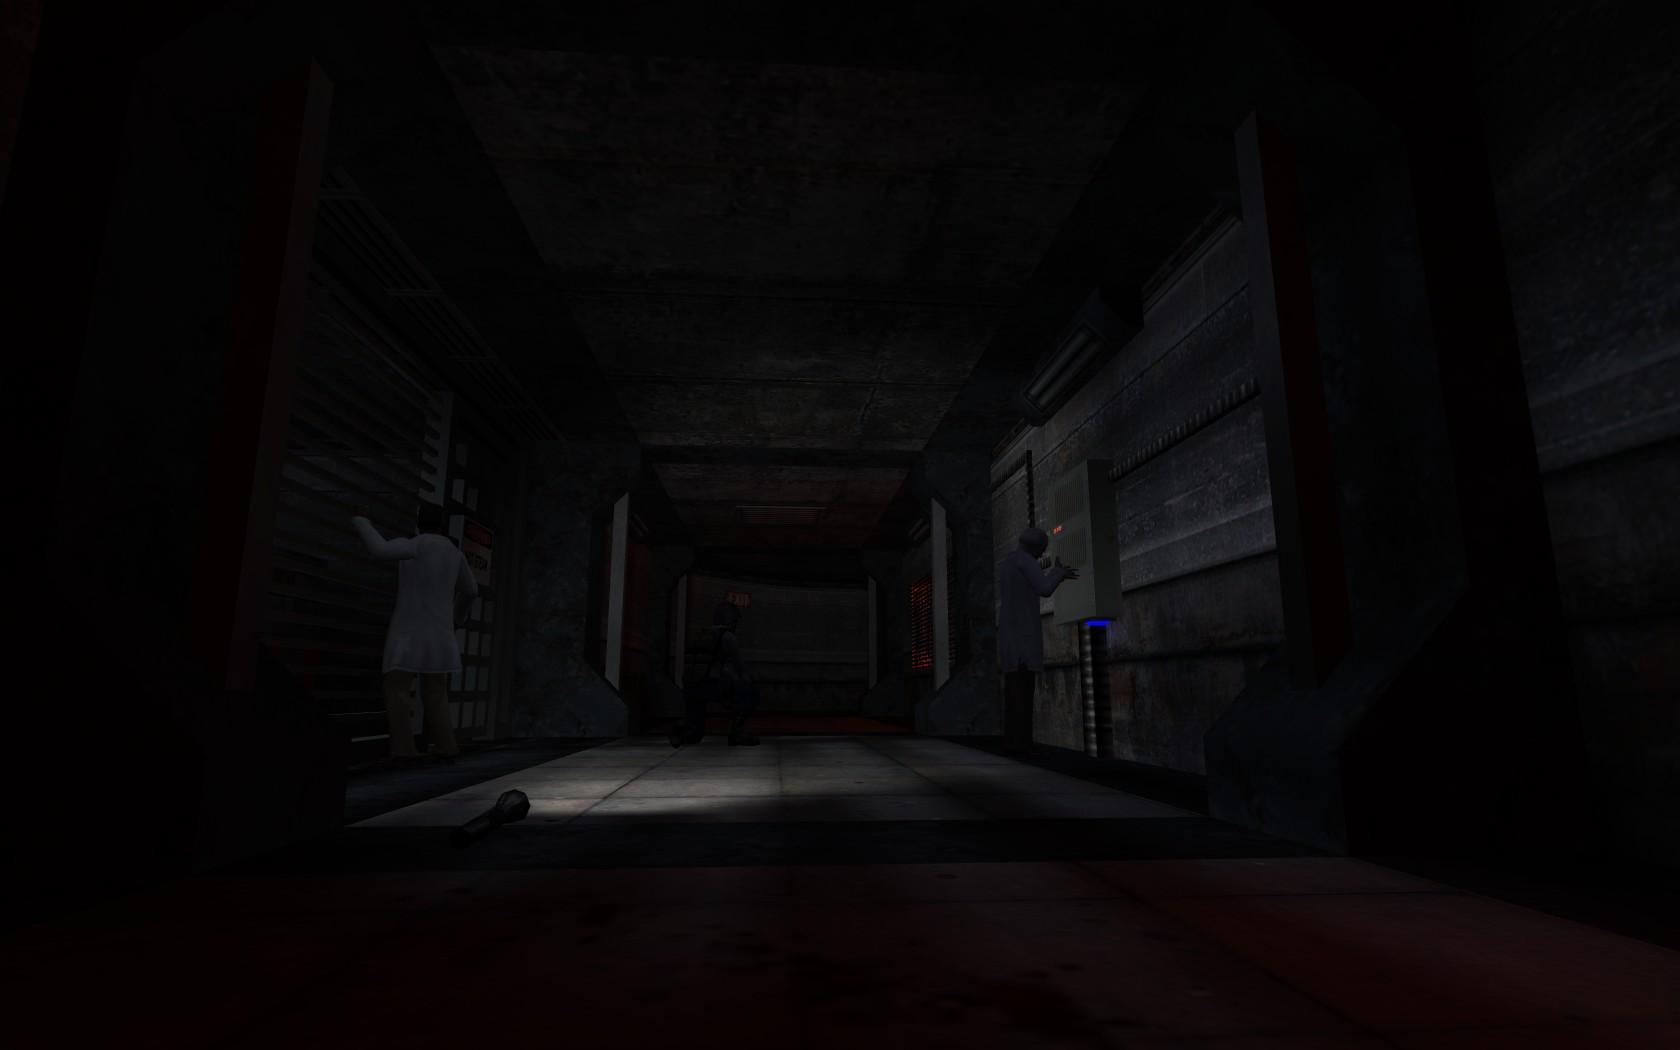 Half-life PC Mods GameWatcher